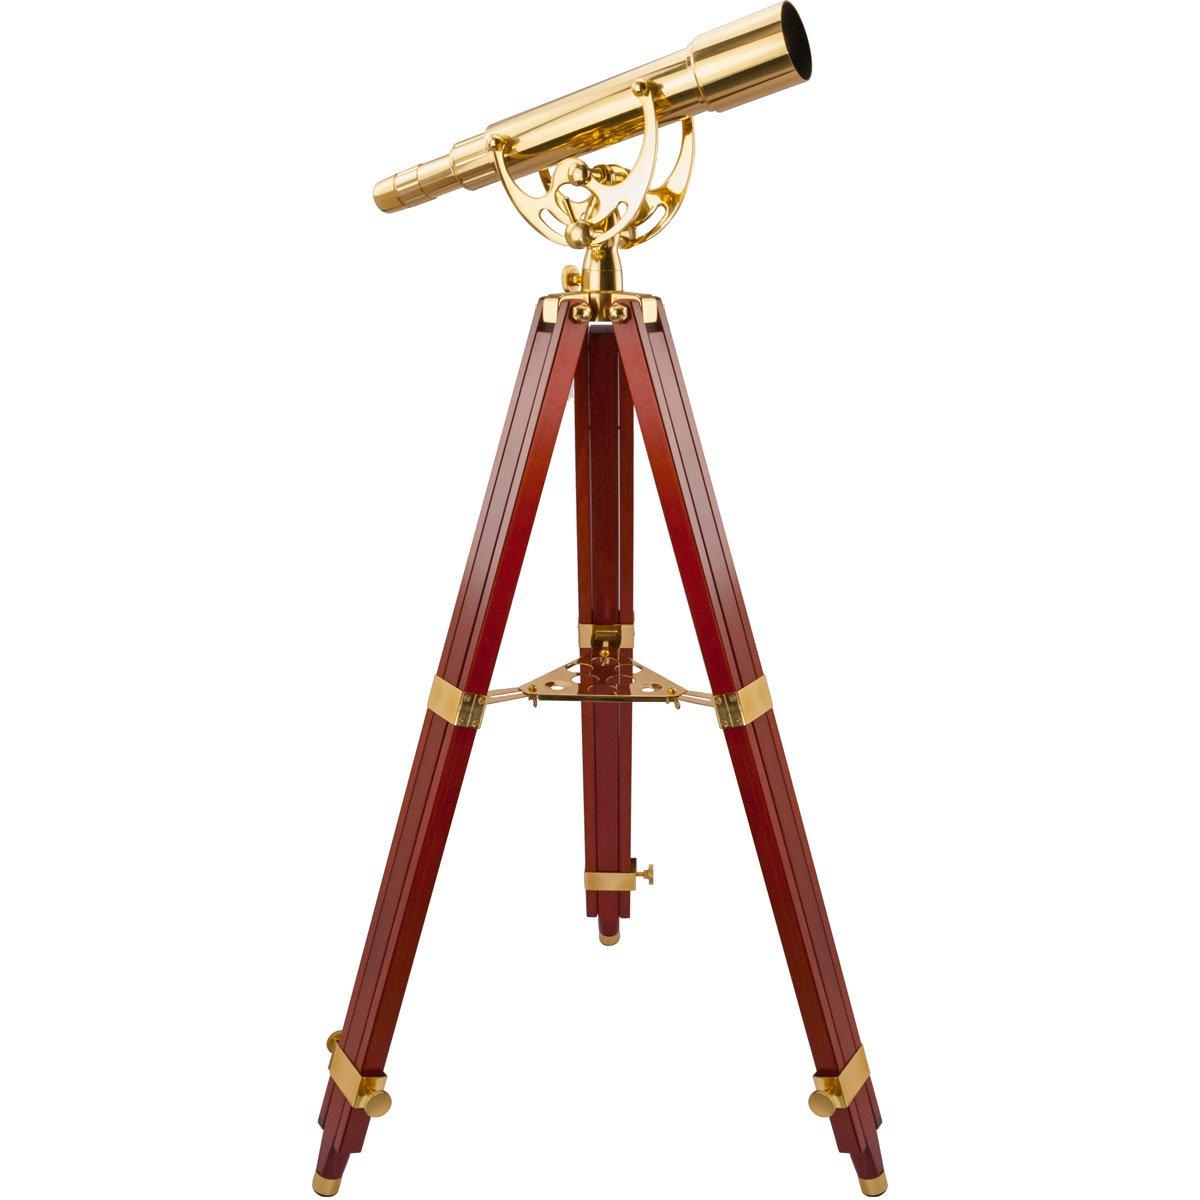 BARSKA Anchormaster 15-45x50 Spyscope w/ Mahogany Floor Tripod by BARSKA